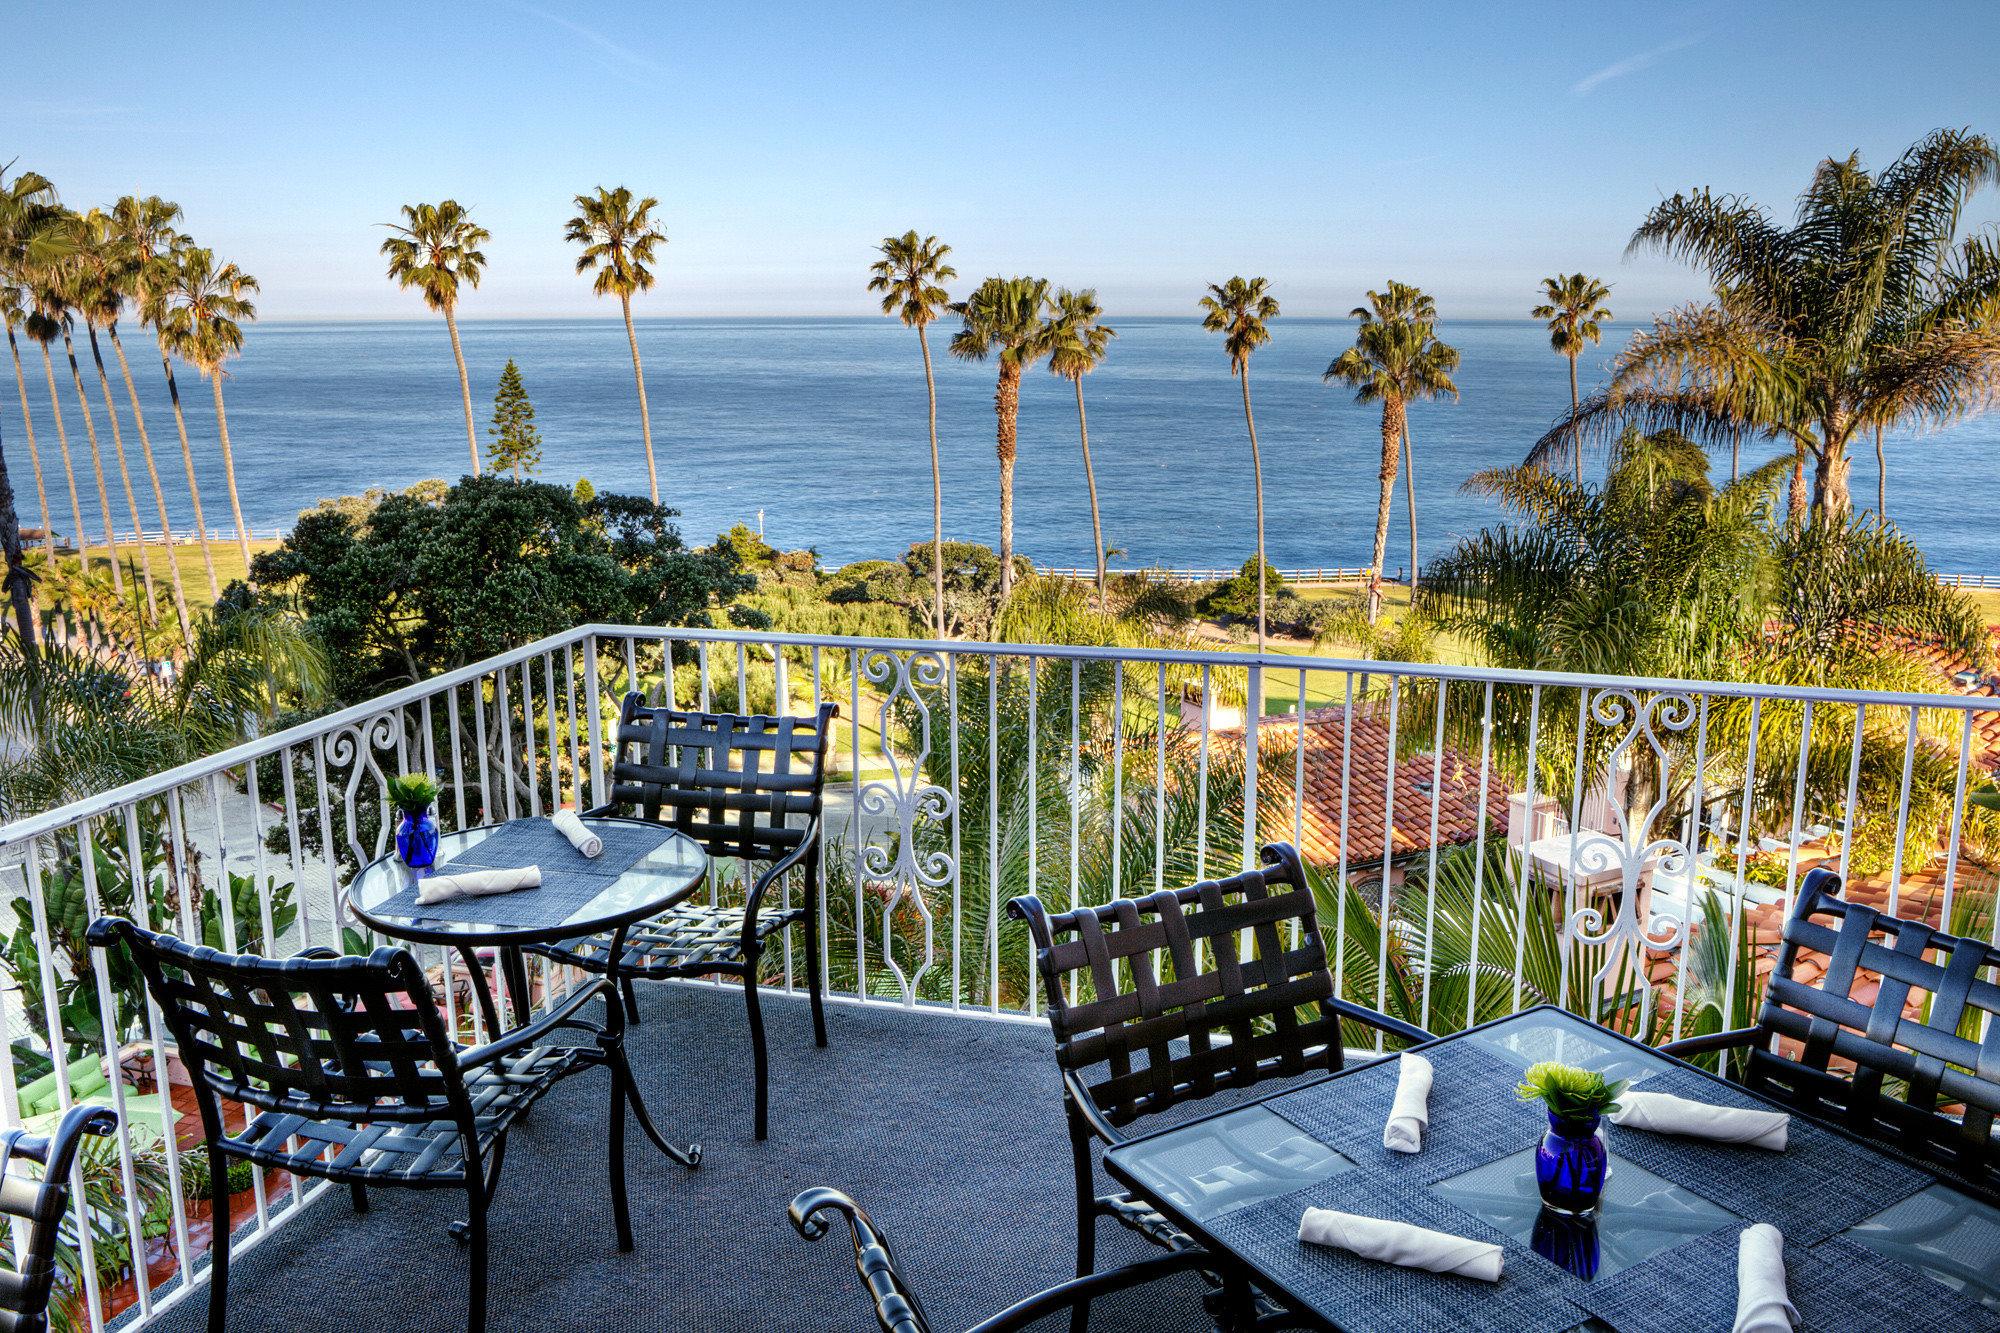 Balcony Dining Drink Eat Elegant Hotels Luxury Ocean Scenic views Terrace Tropical sky Fence outdoor leisure estate Deck park backyard real estate Resort porch walkway overlooking